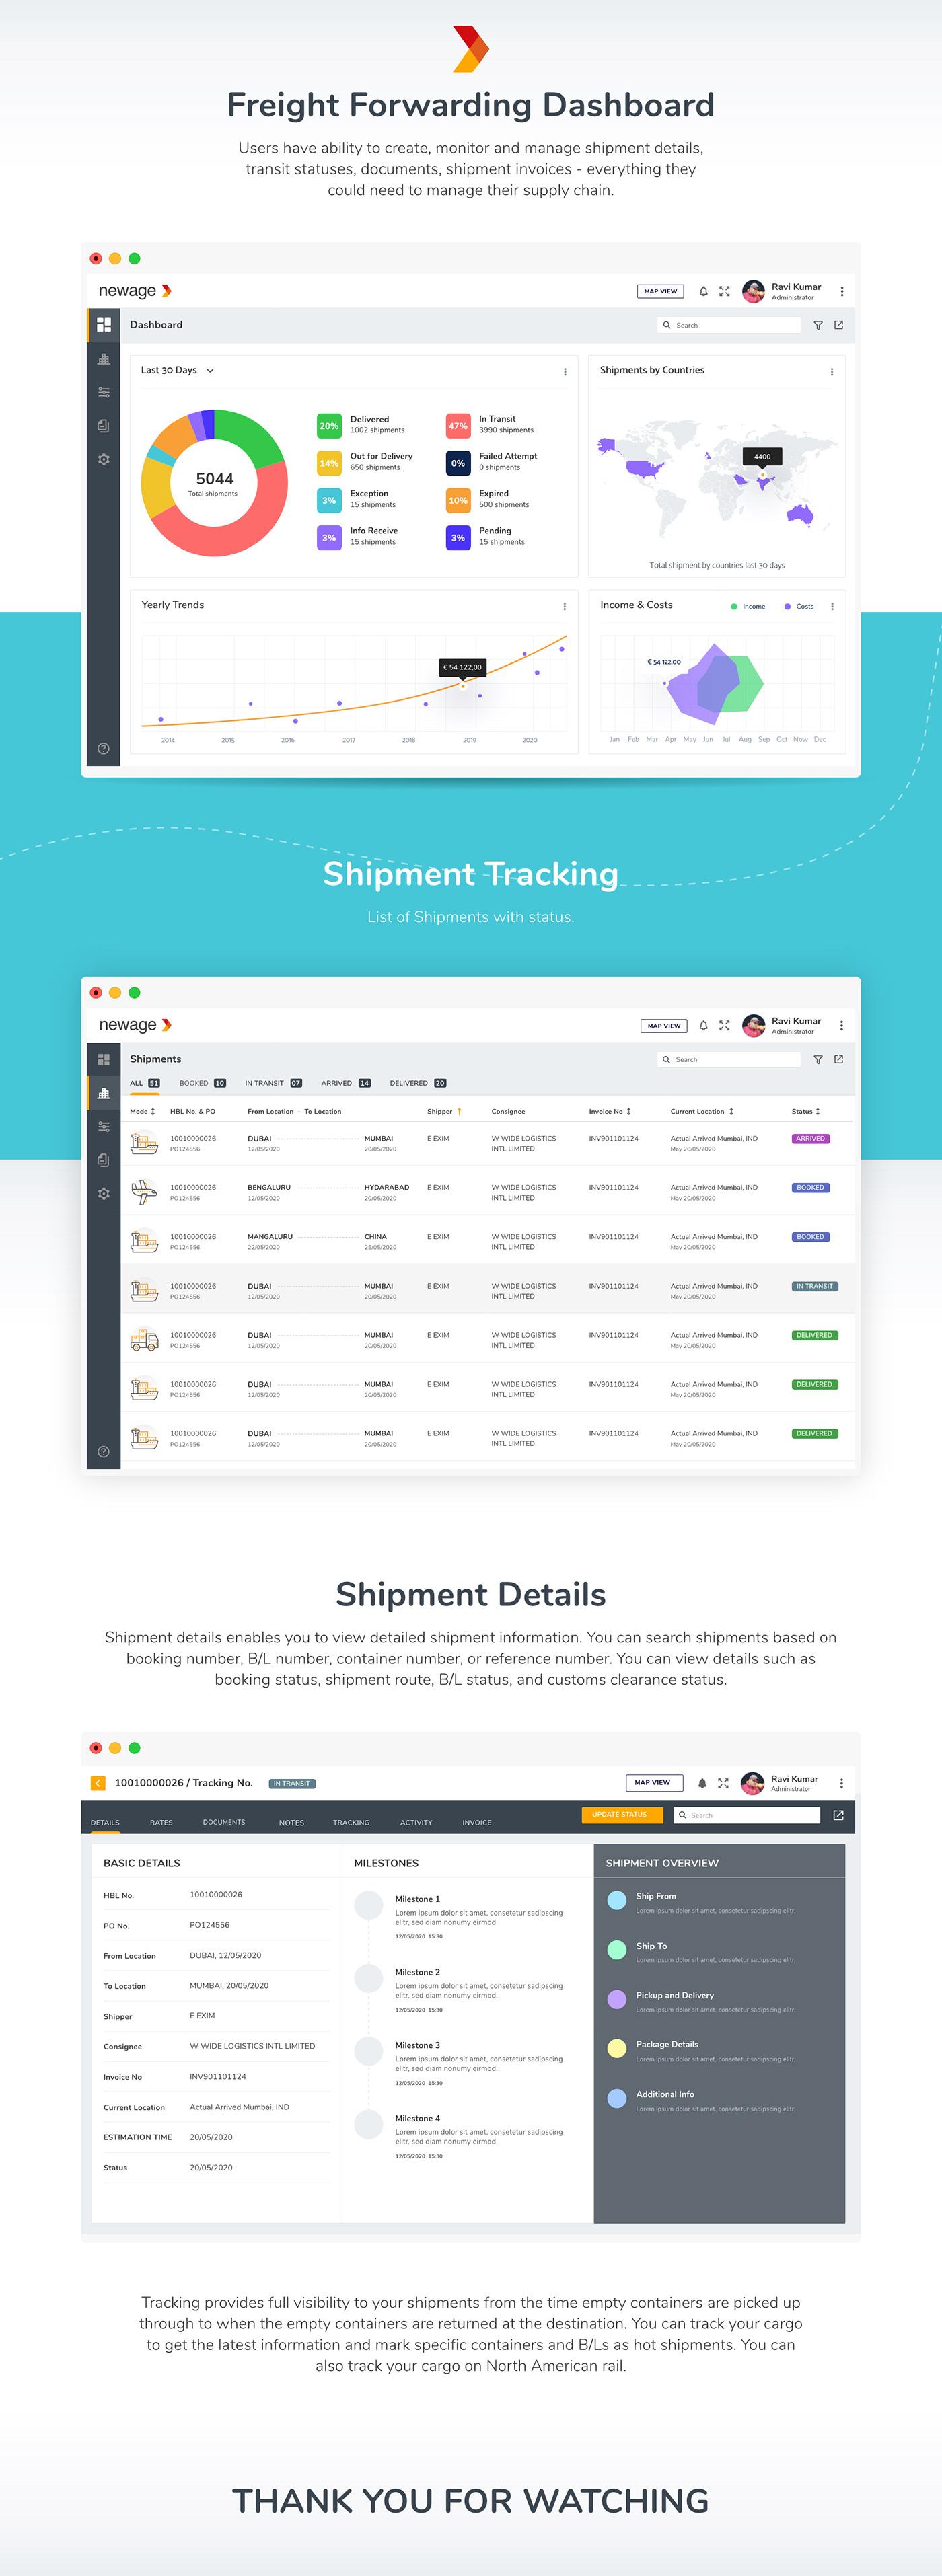 dashboard freight Freight Forwarding shipment Shipment tracking tracking Transport transportation user tracking UX FOR SHIPMENT